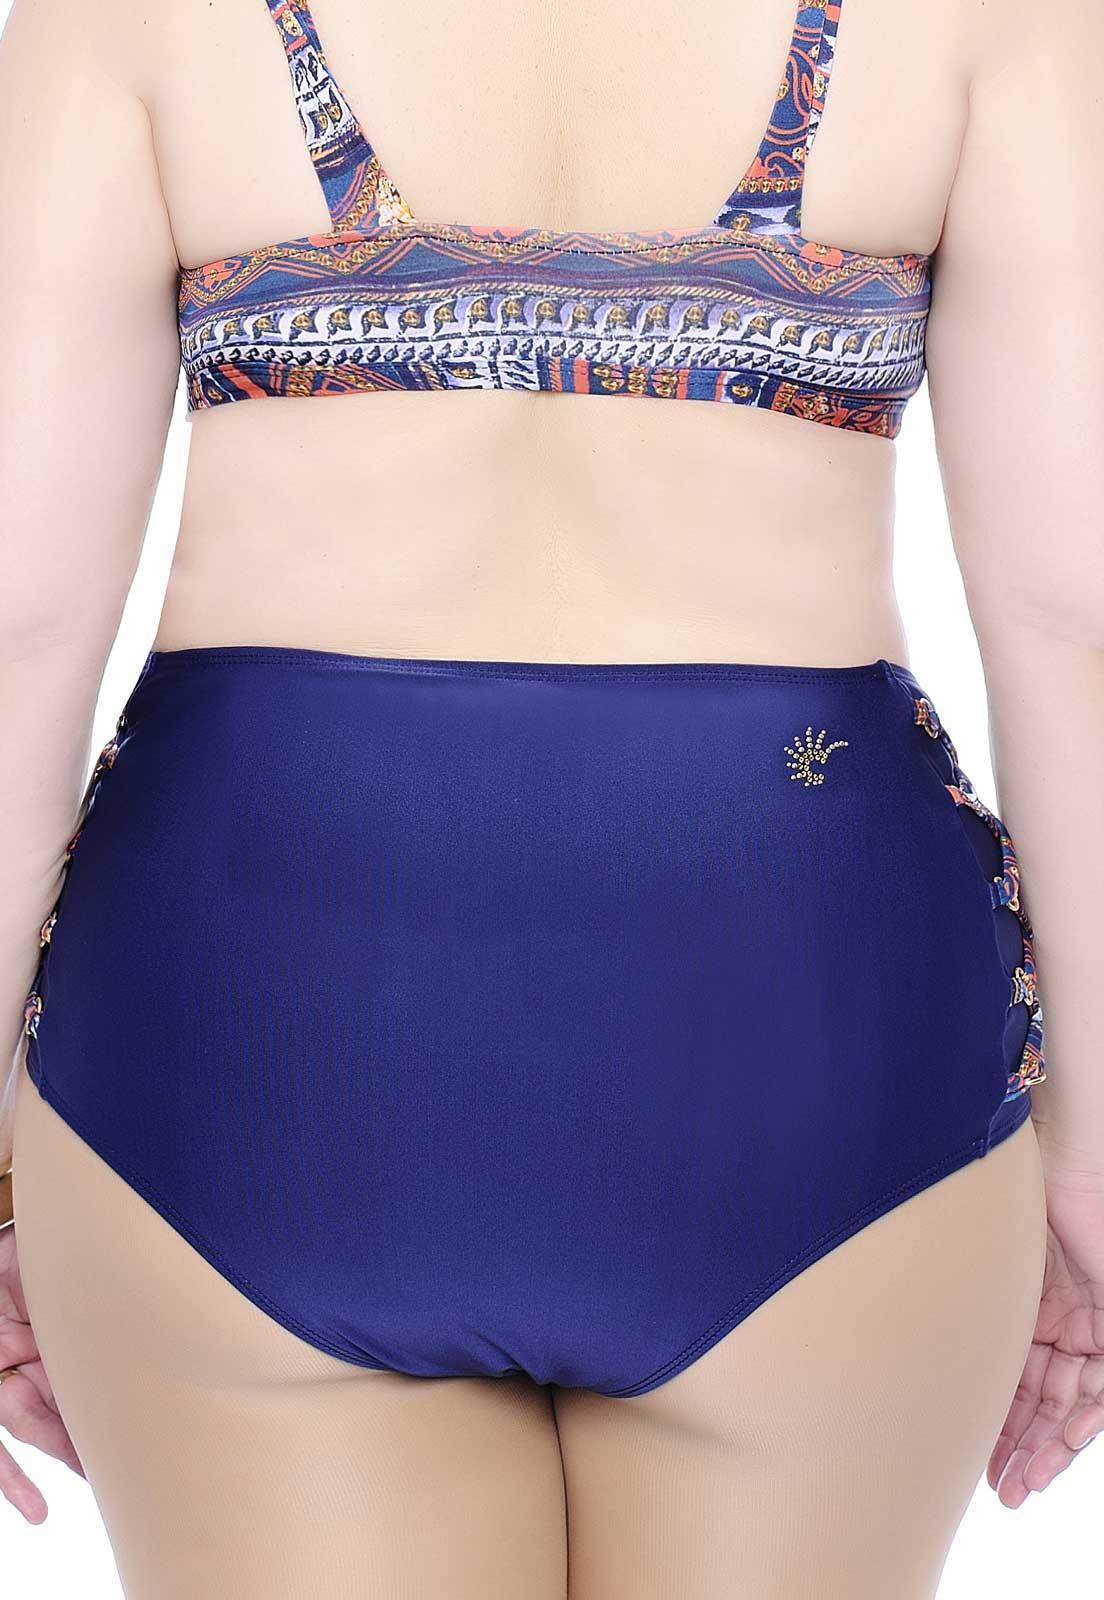 e90a16a79 Biquíni Tanga Plus Size Hot Pants com Detalhe - Belle Plage